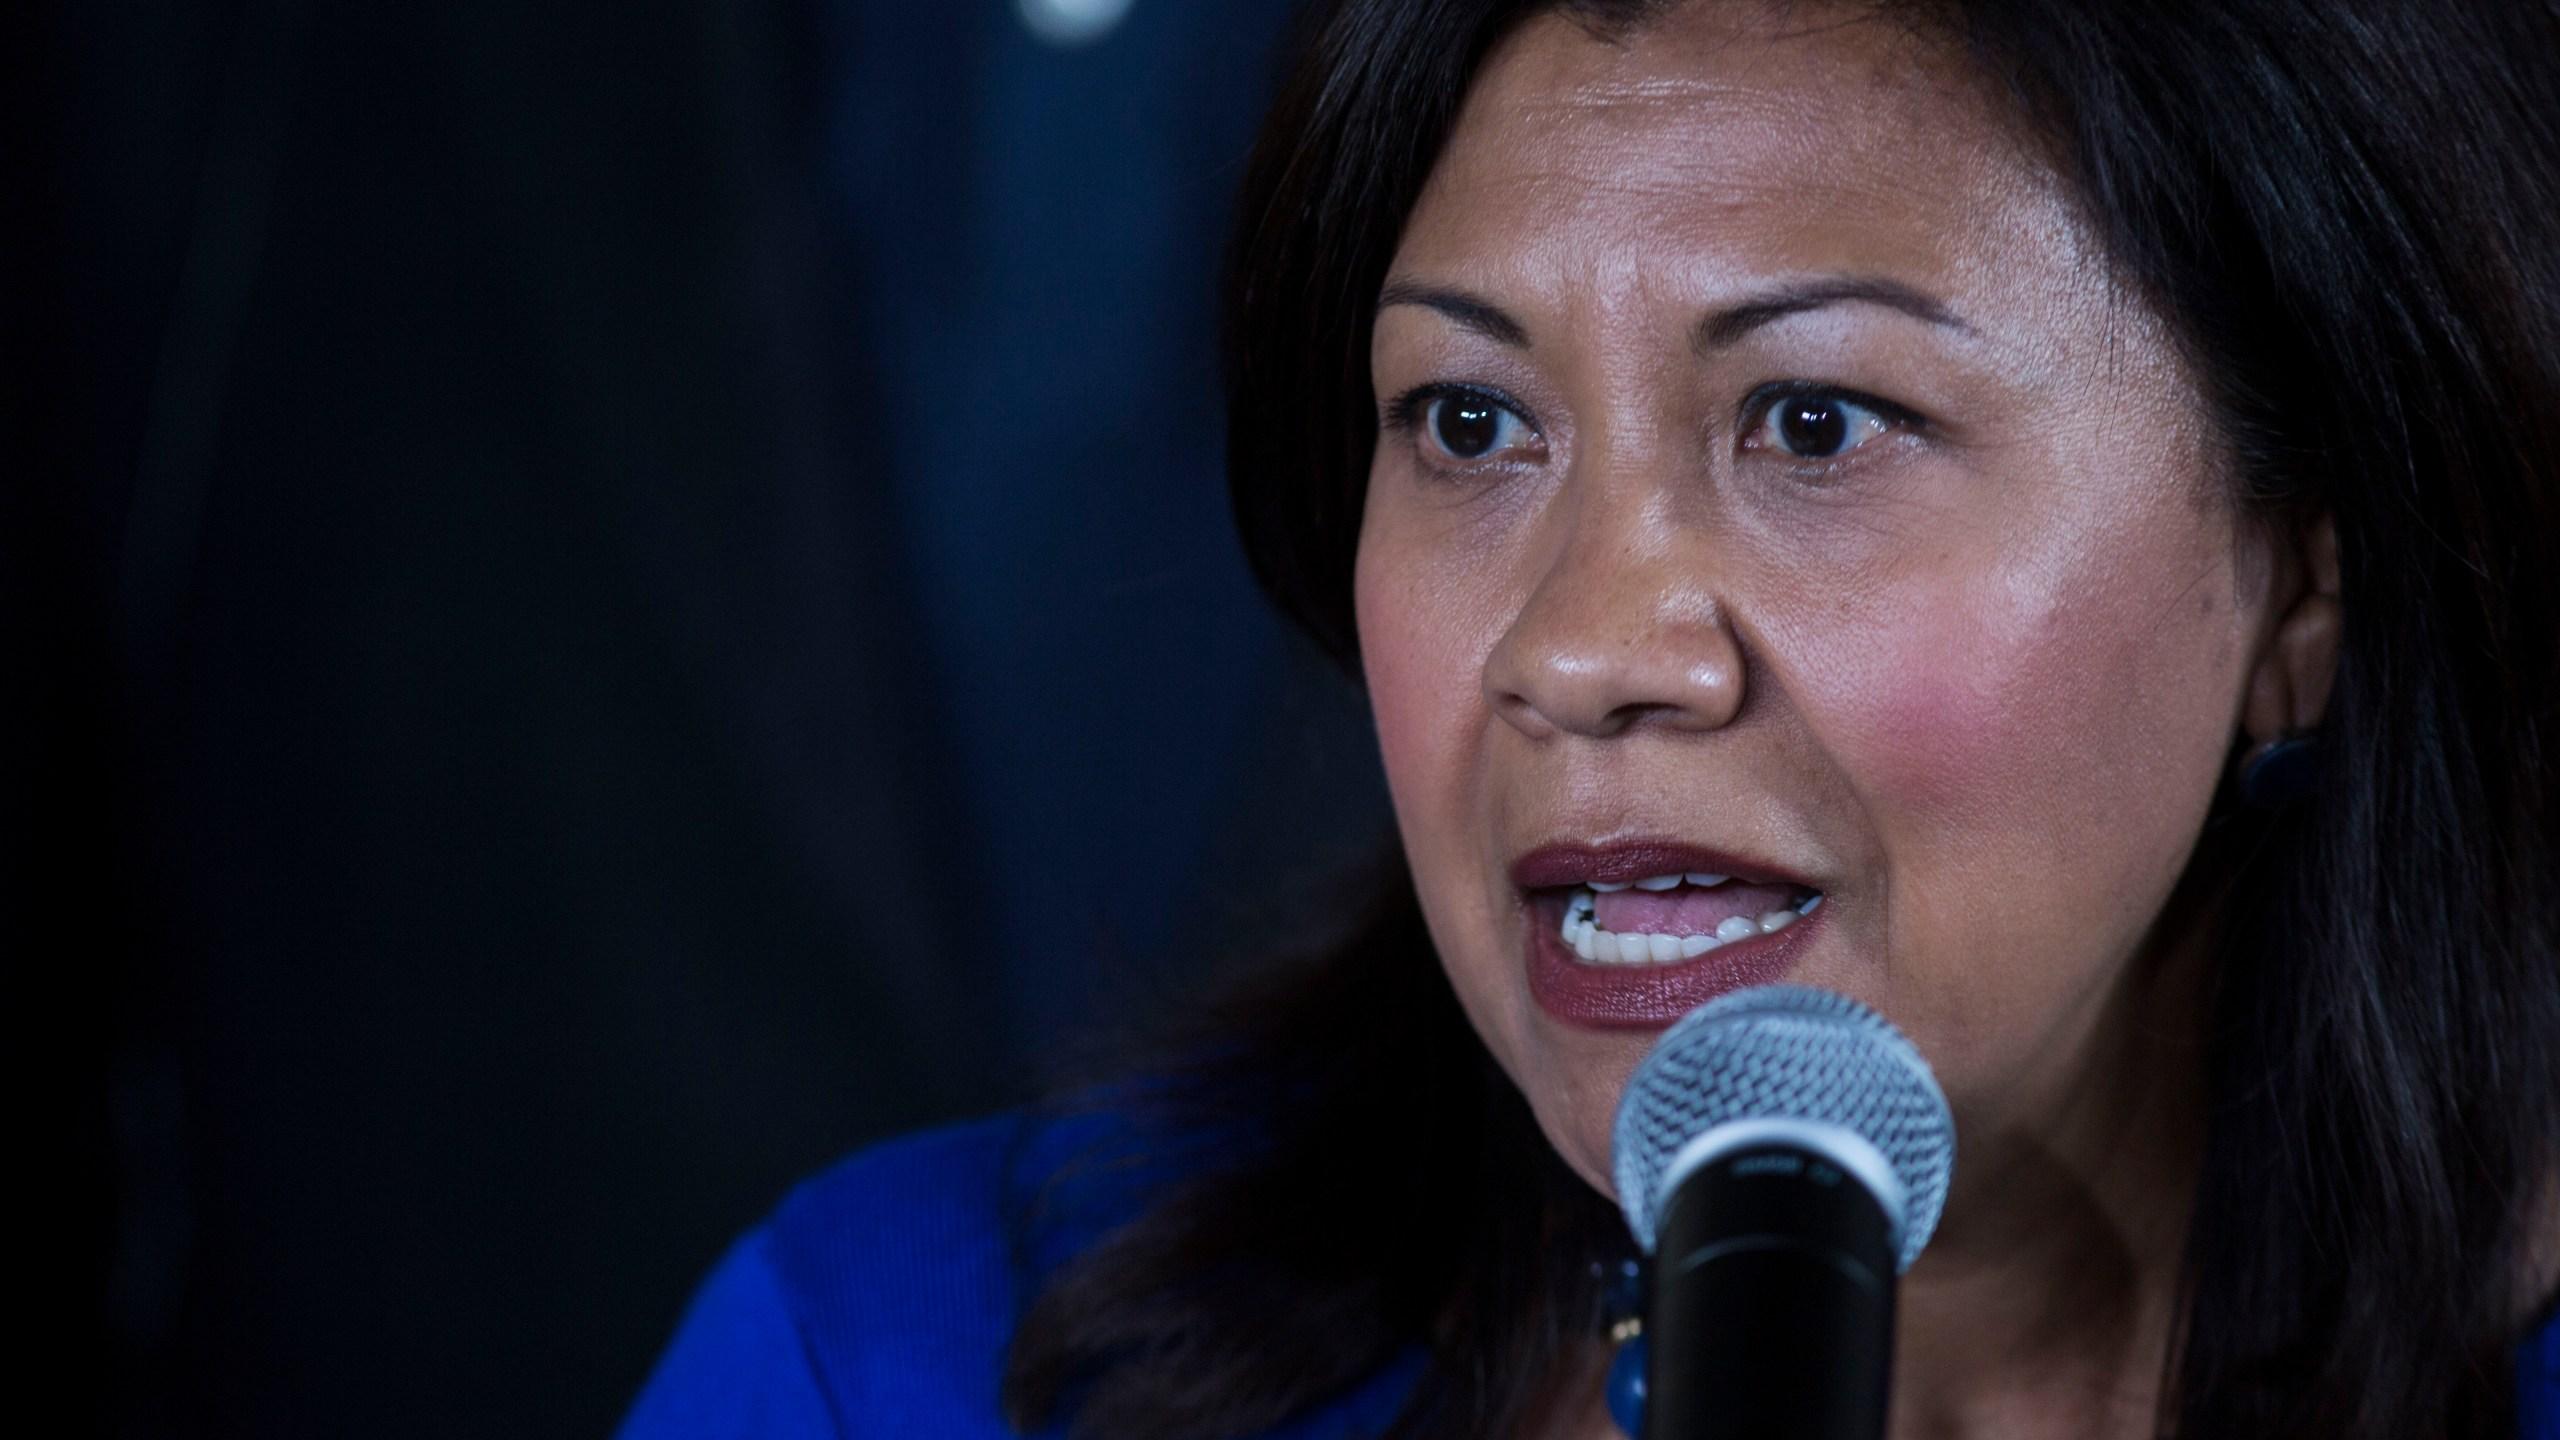 U.S. Rep. Norma Torres, D-Calif. speaks during a news conference on Aug. 8, 2019. (Oliver de Ros/Associated Press)